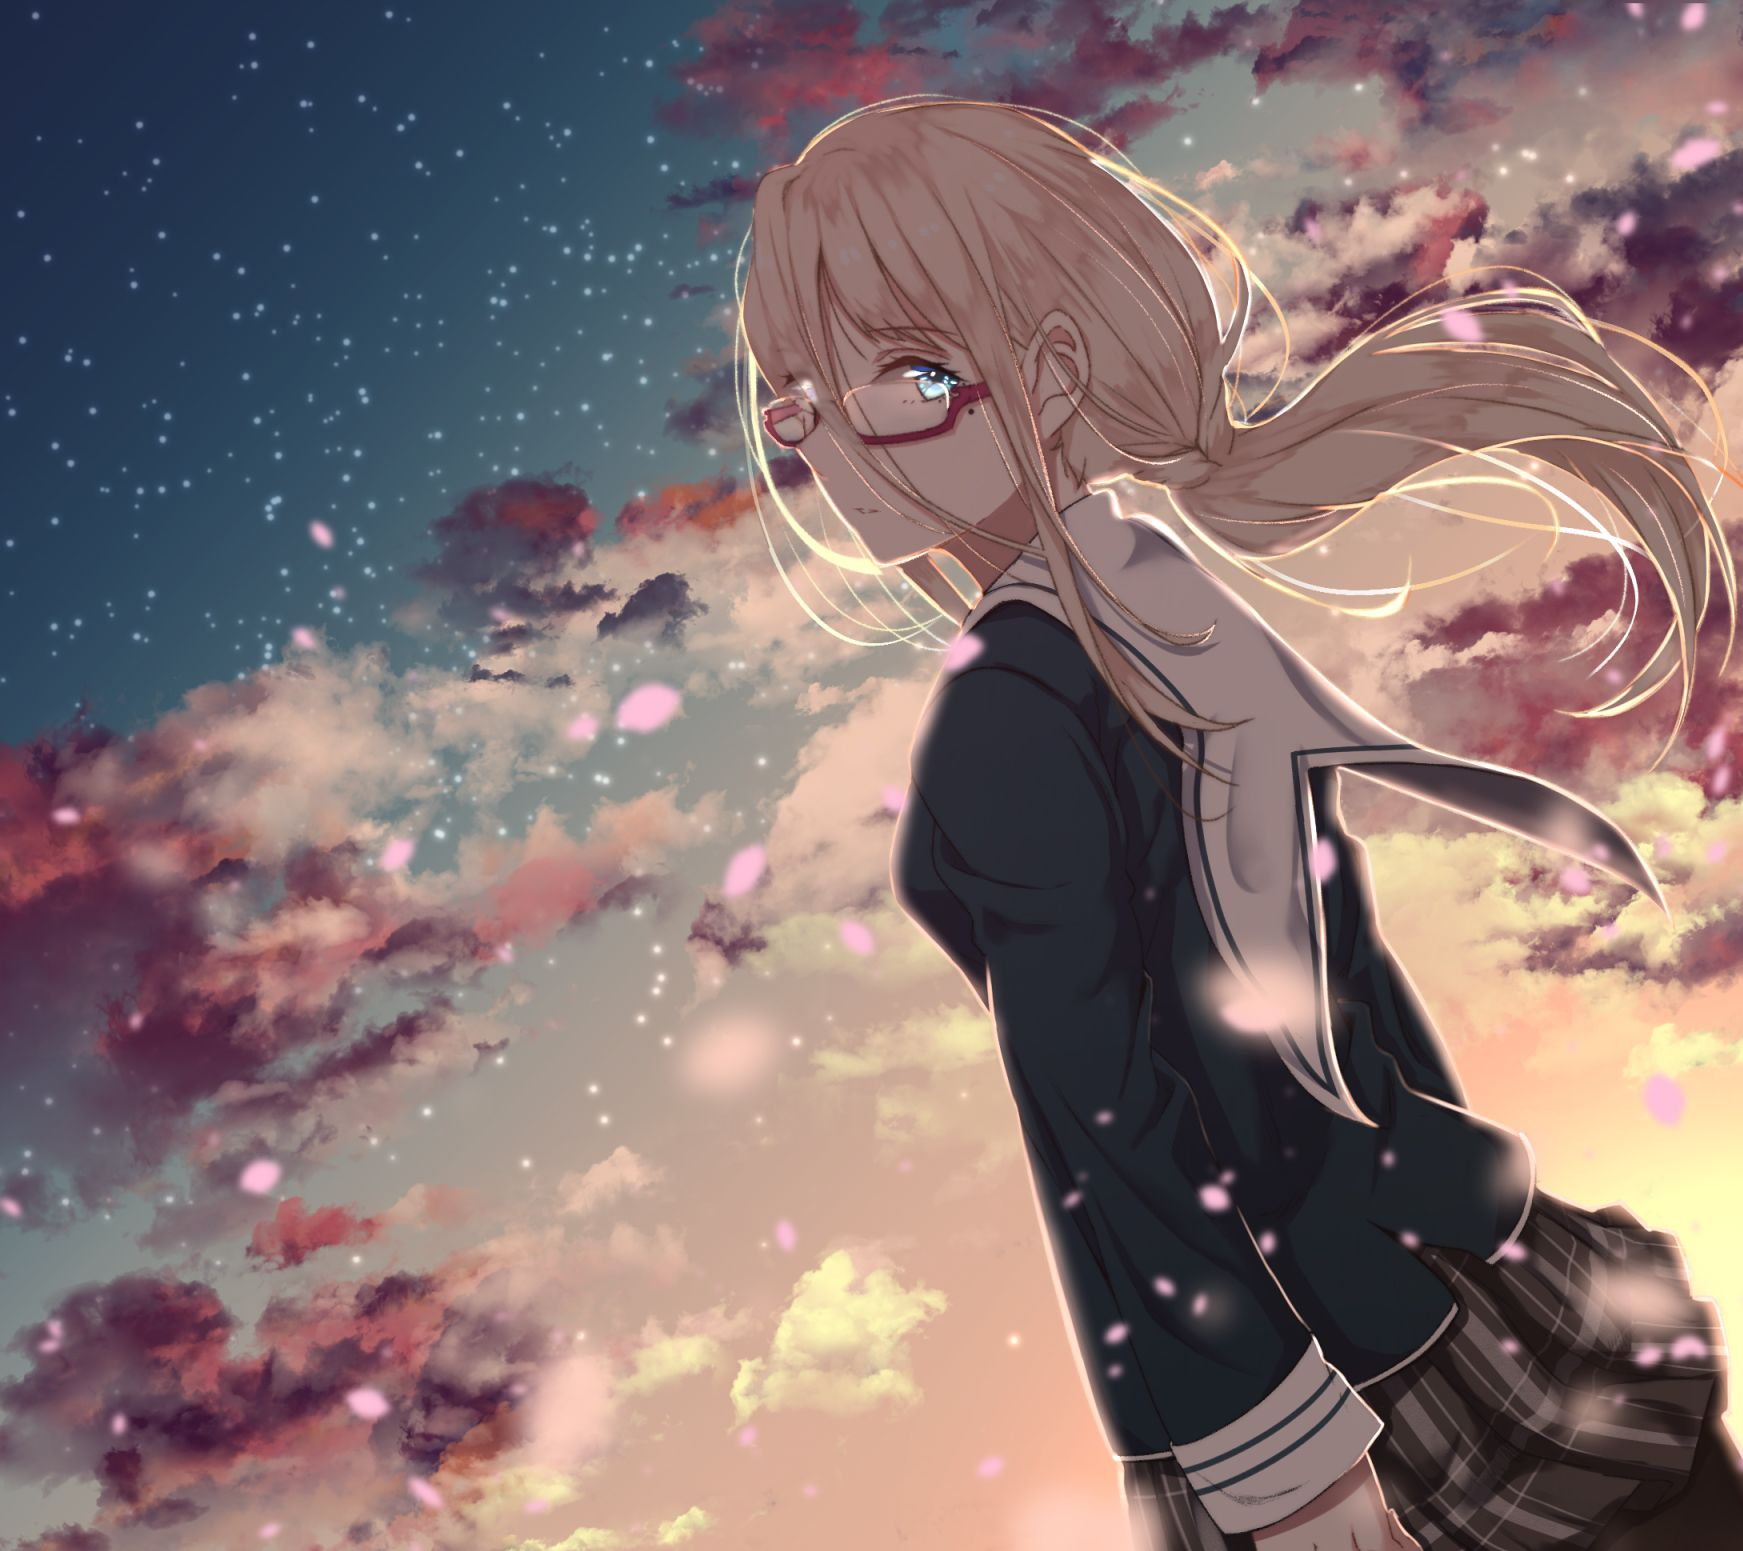 Epingle Par Jerza11etleschats Sur Manga Filles Blondes Illustration Kawaii